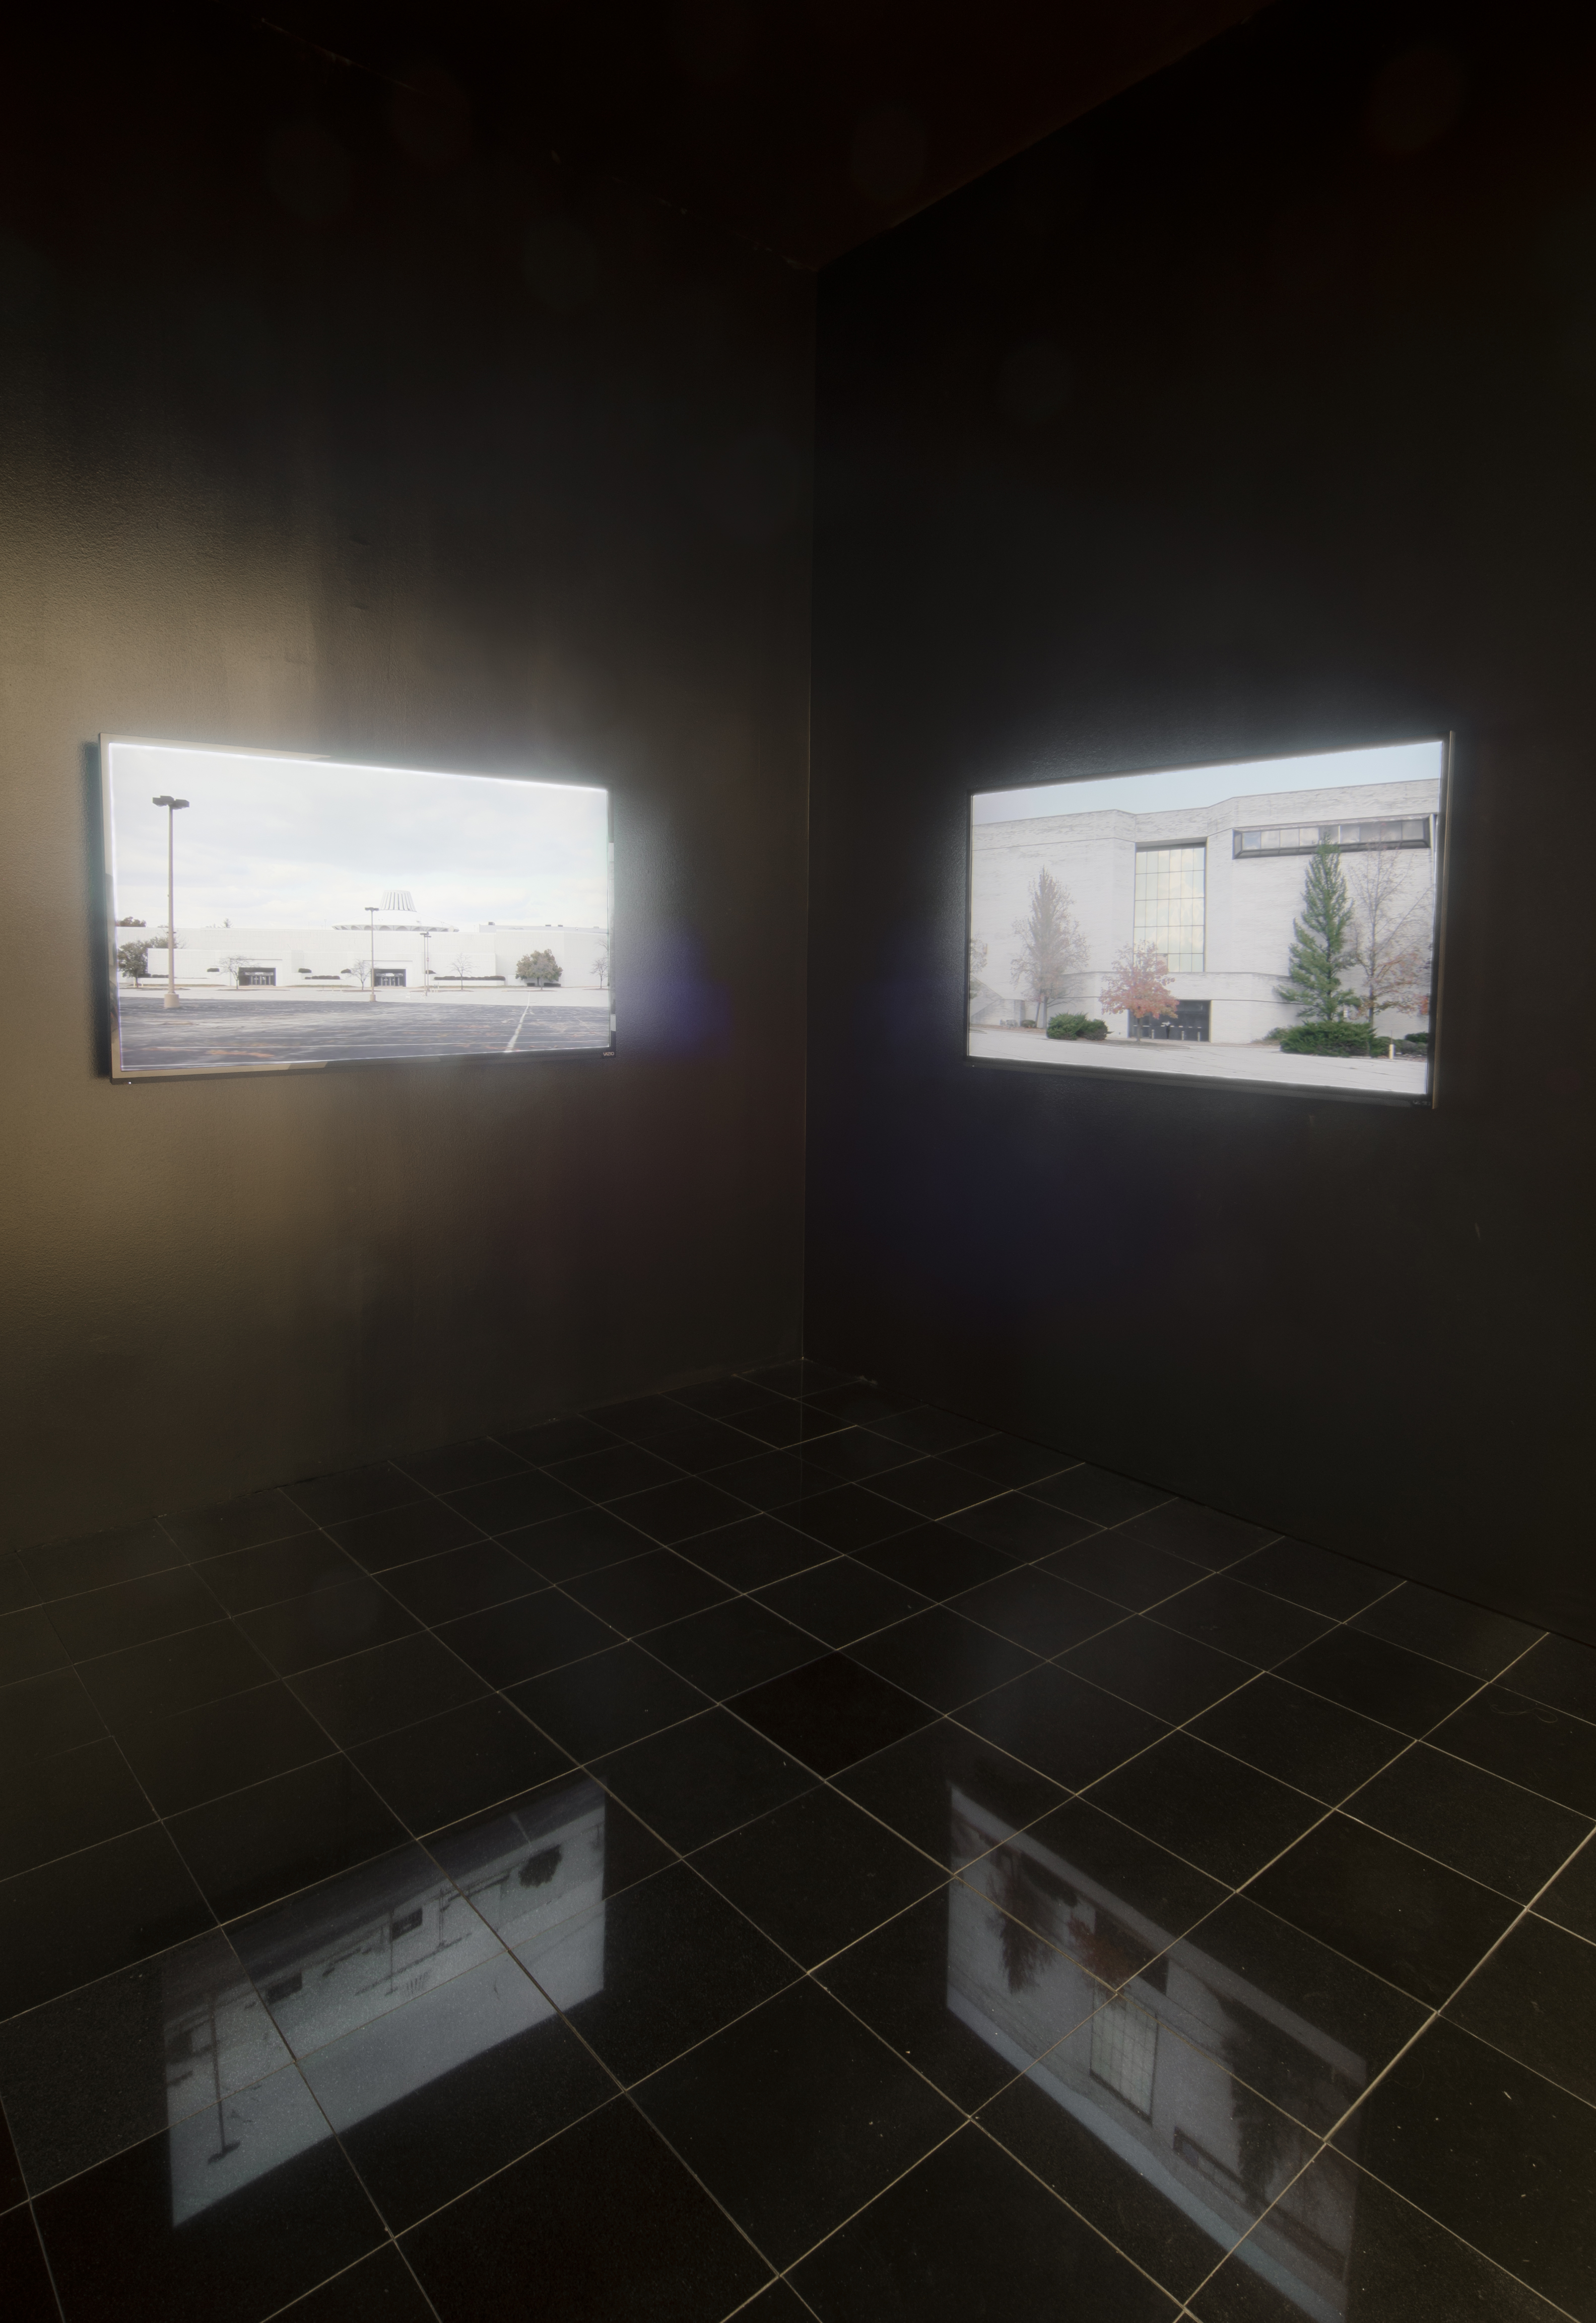 Installation view of screens of Retail Requiem at Mildred Kemper Lane Art Museum